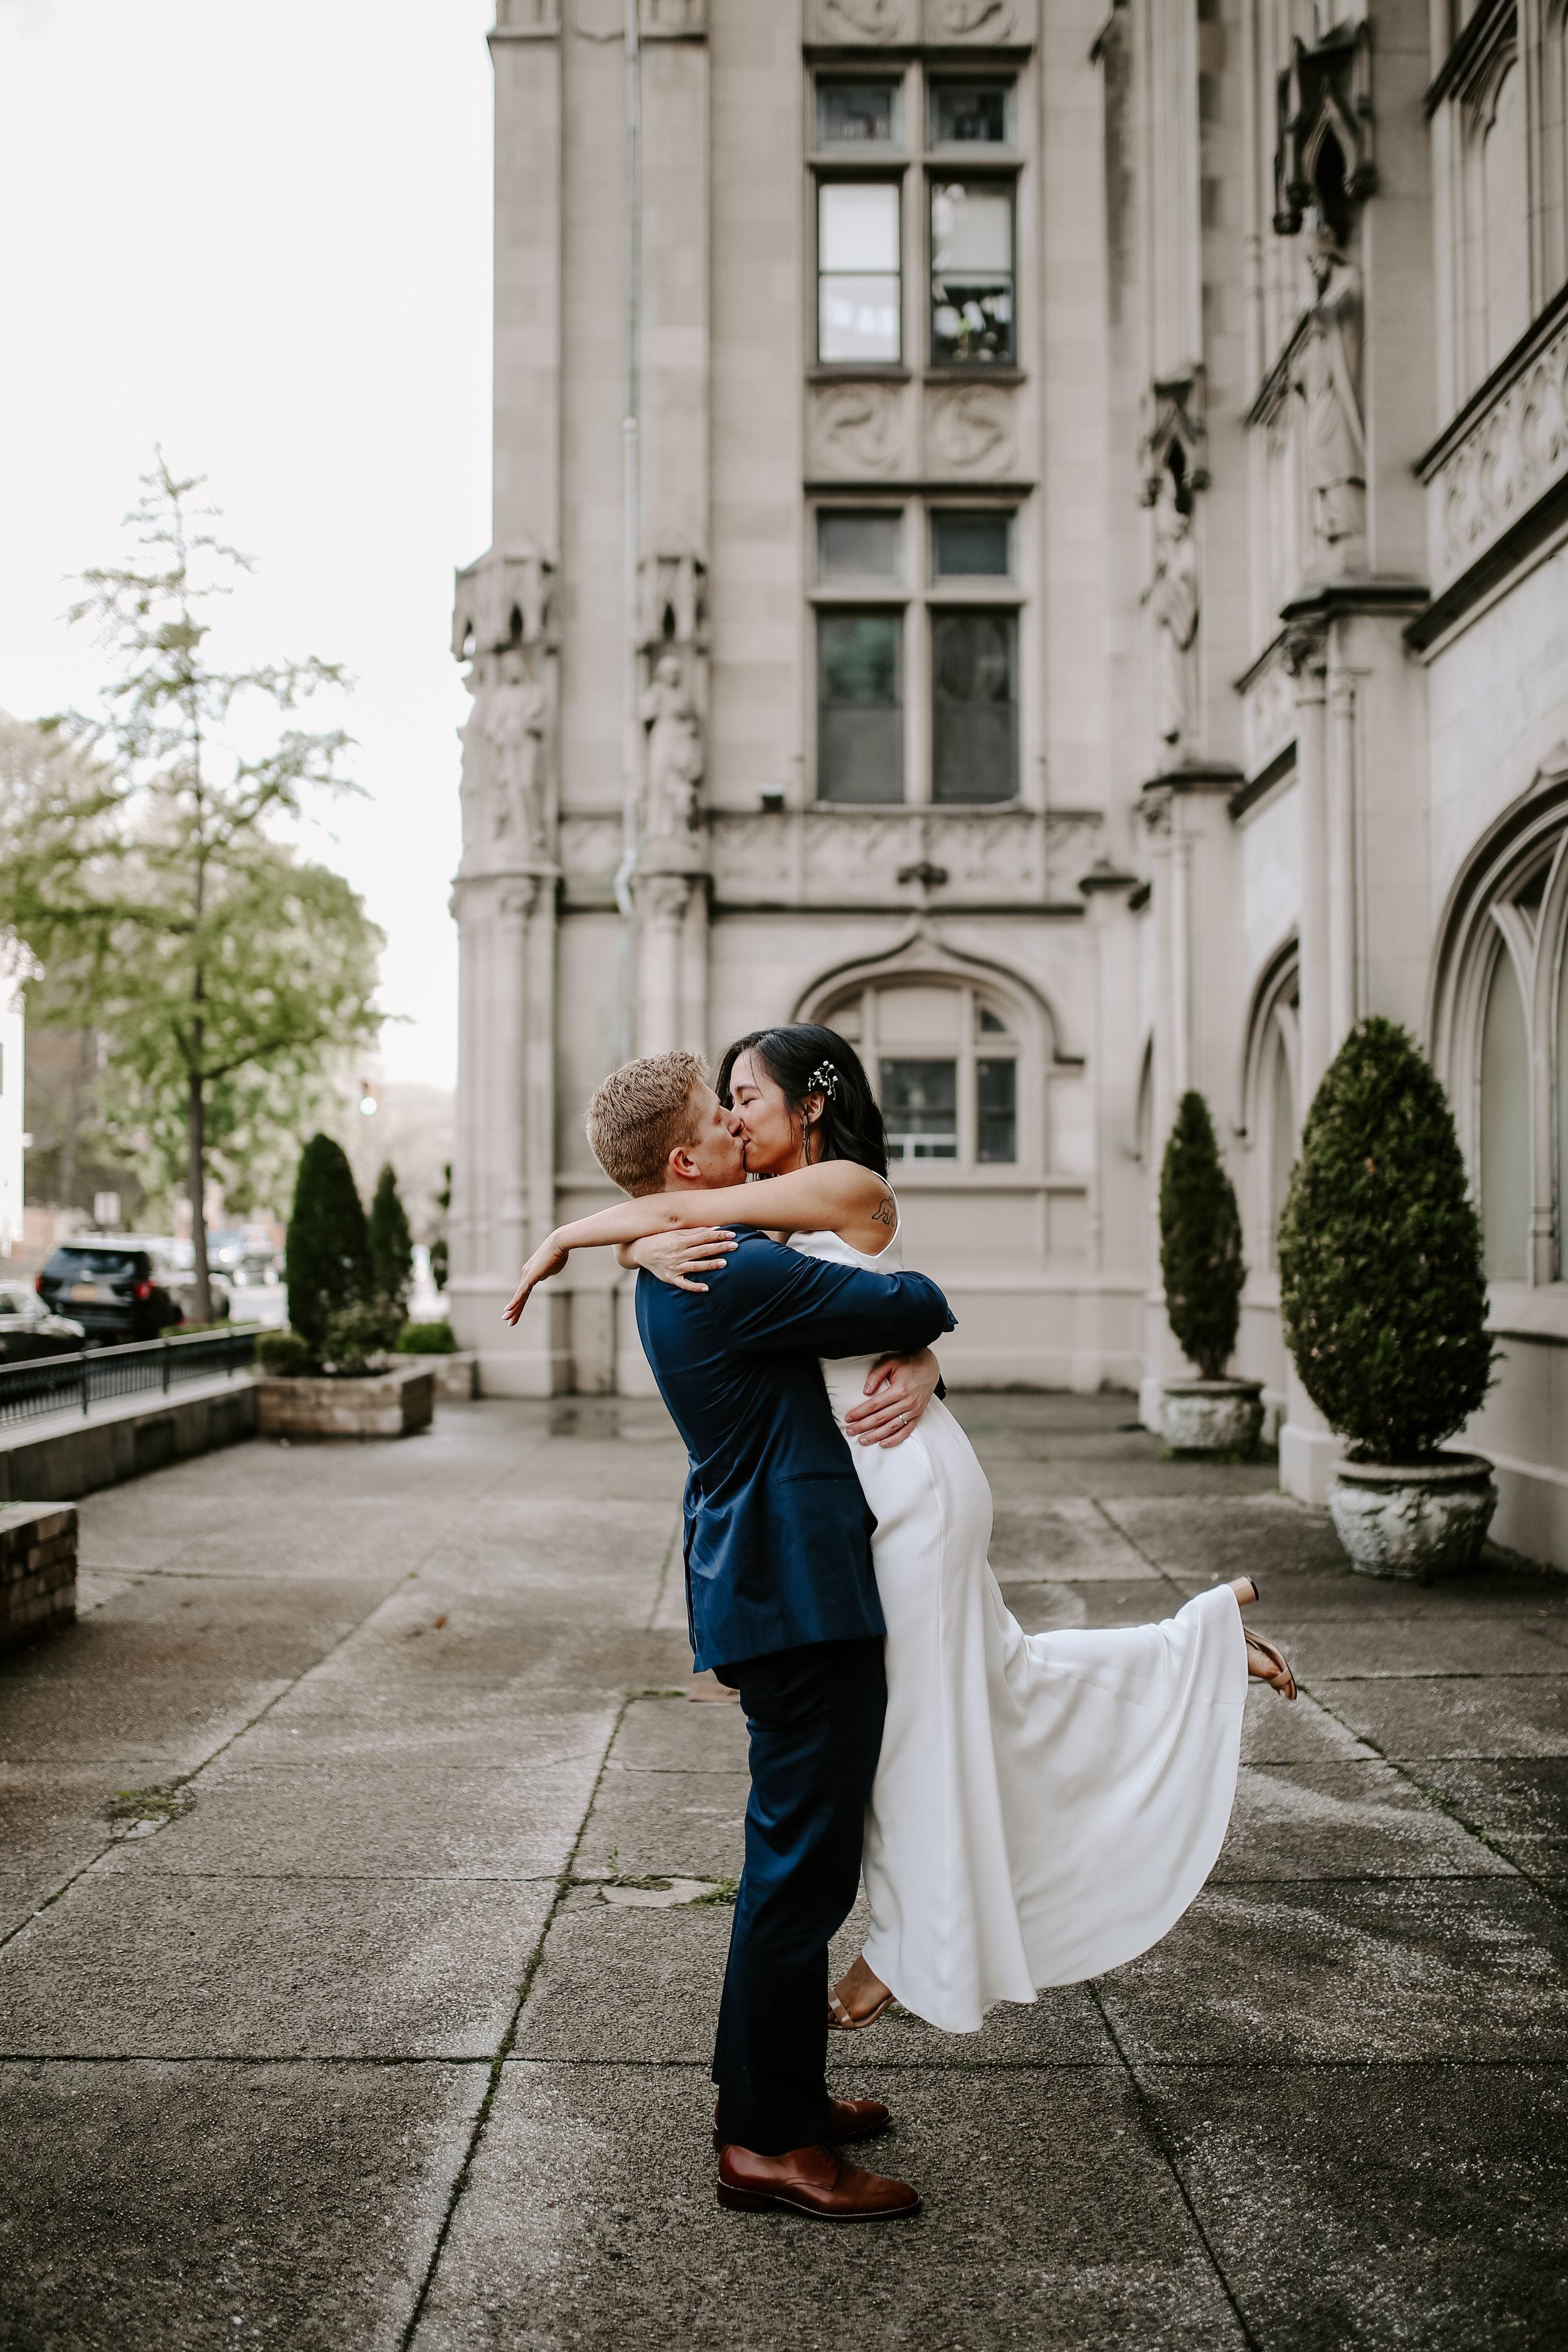 TheNichols_Married_2019-16.jpg